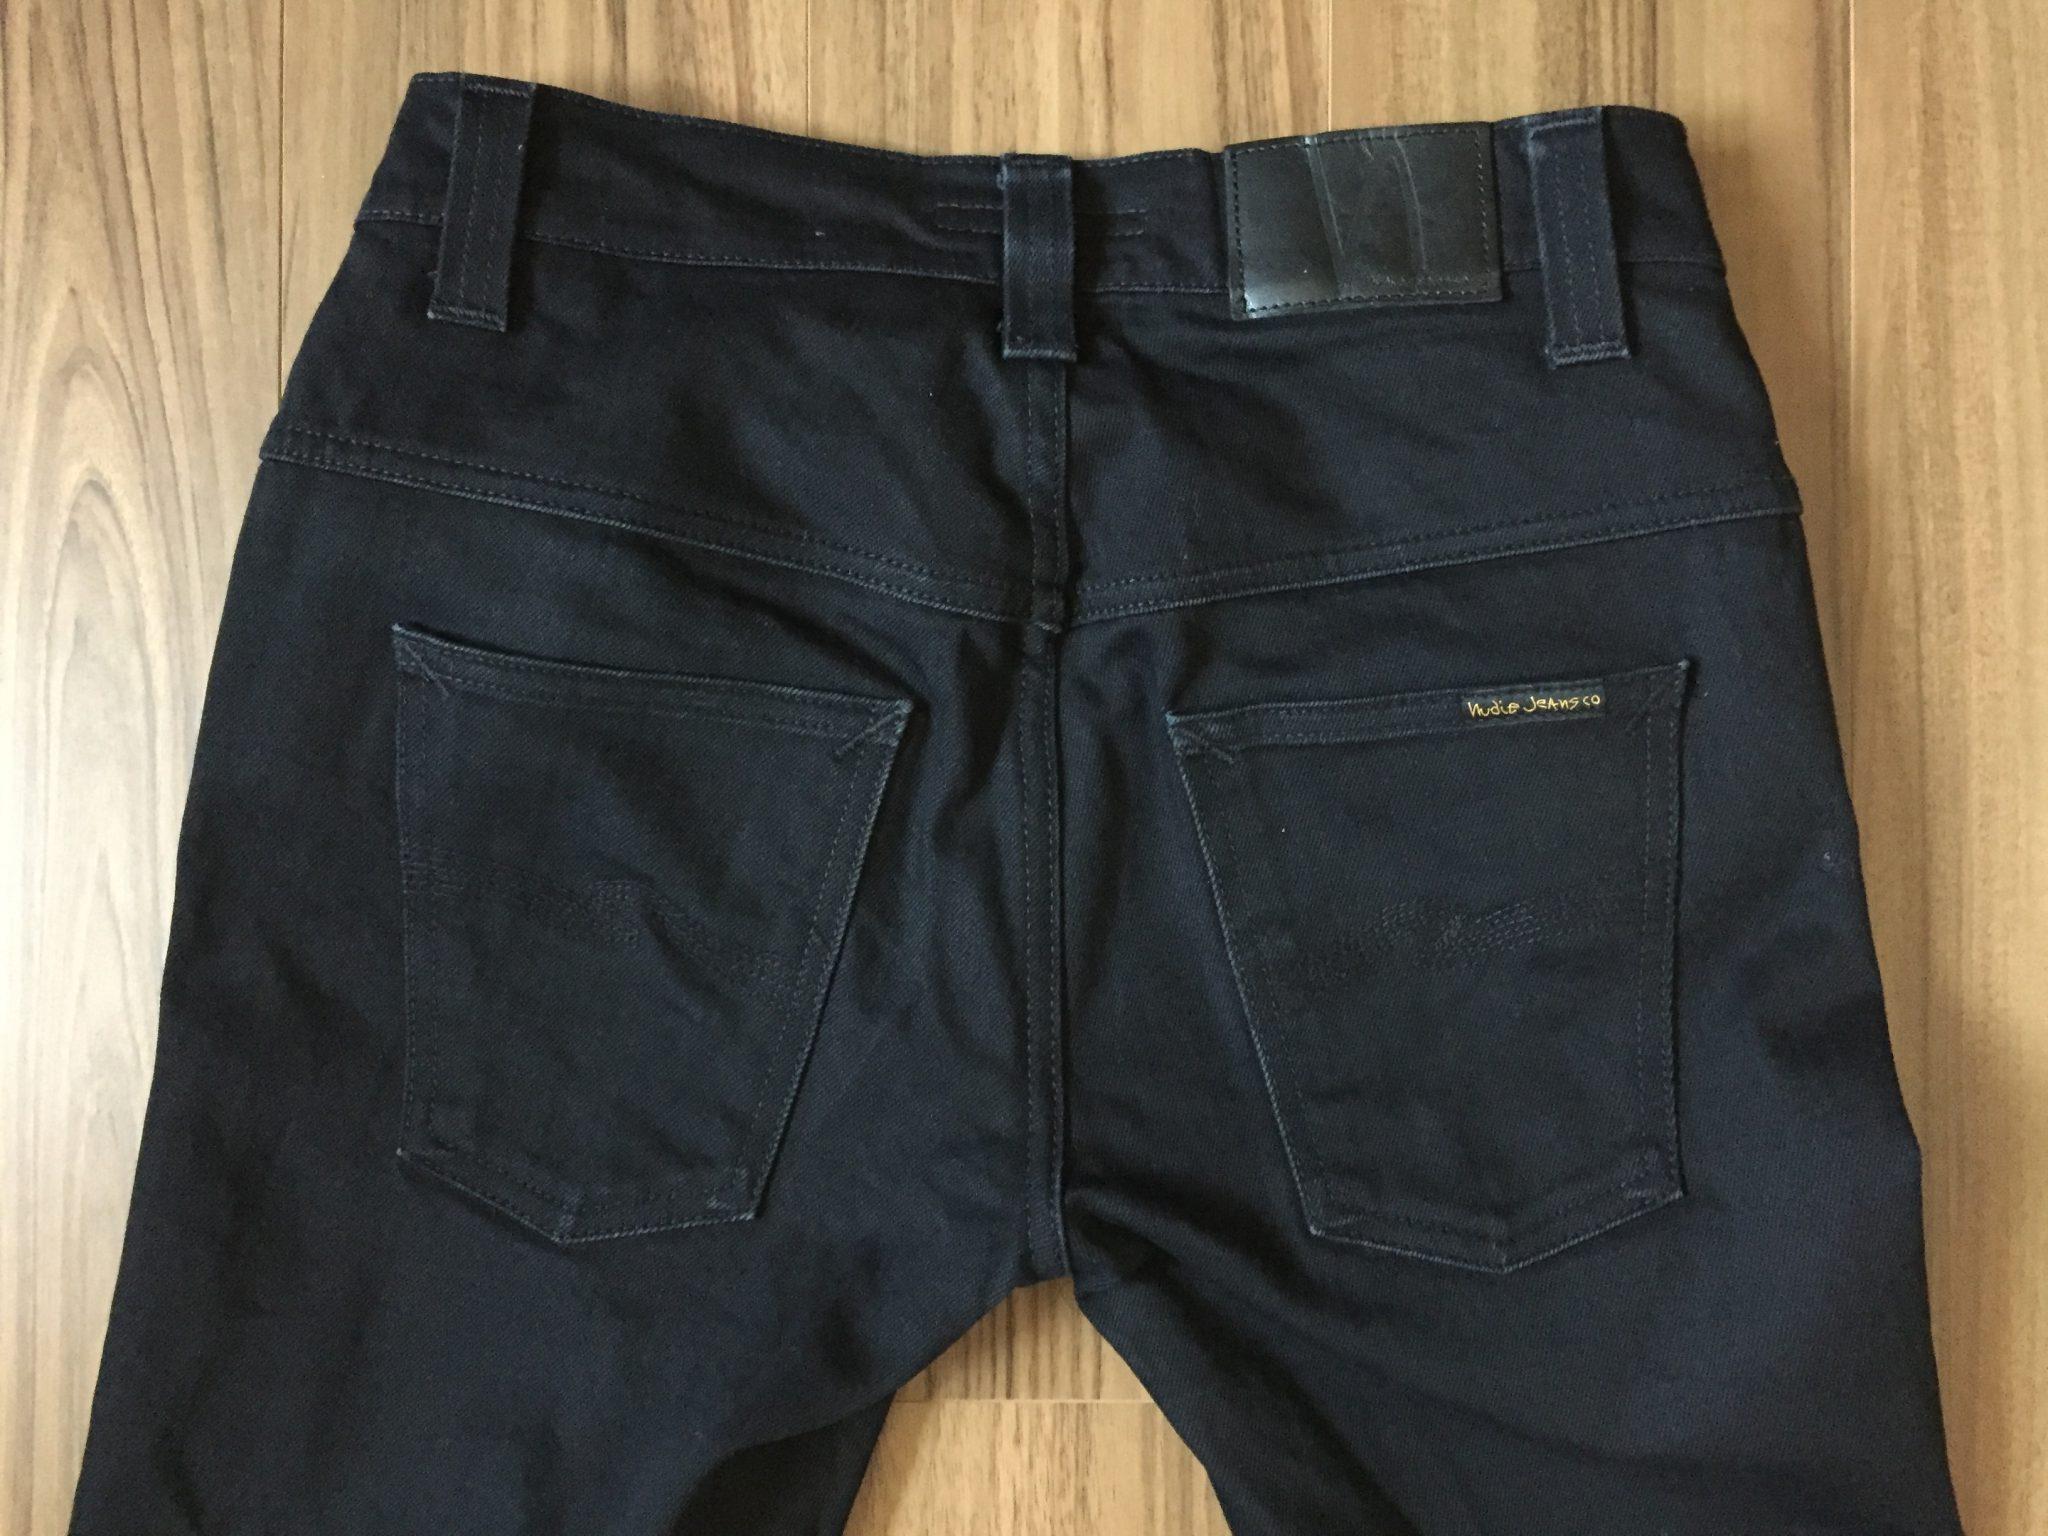 NudieJeans ThinFinn BlackRing 2nd Wash|大切に穿いているヌーディのブラックジーンズを79日1000時間で2回目の洗濯